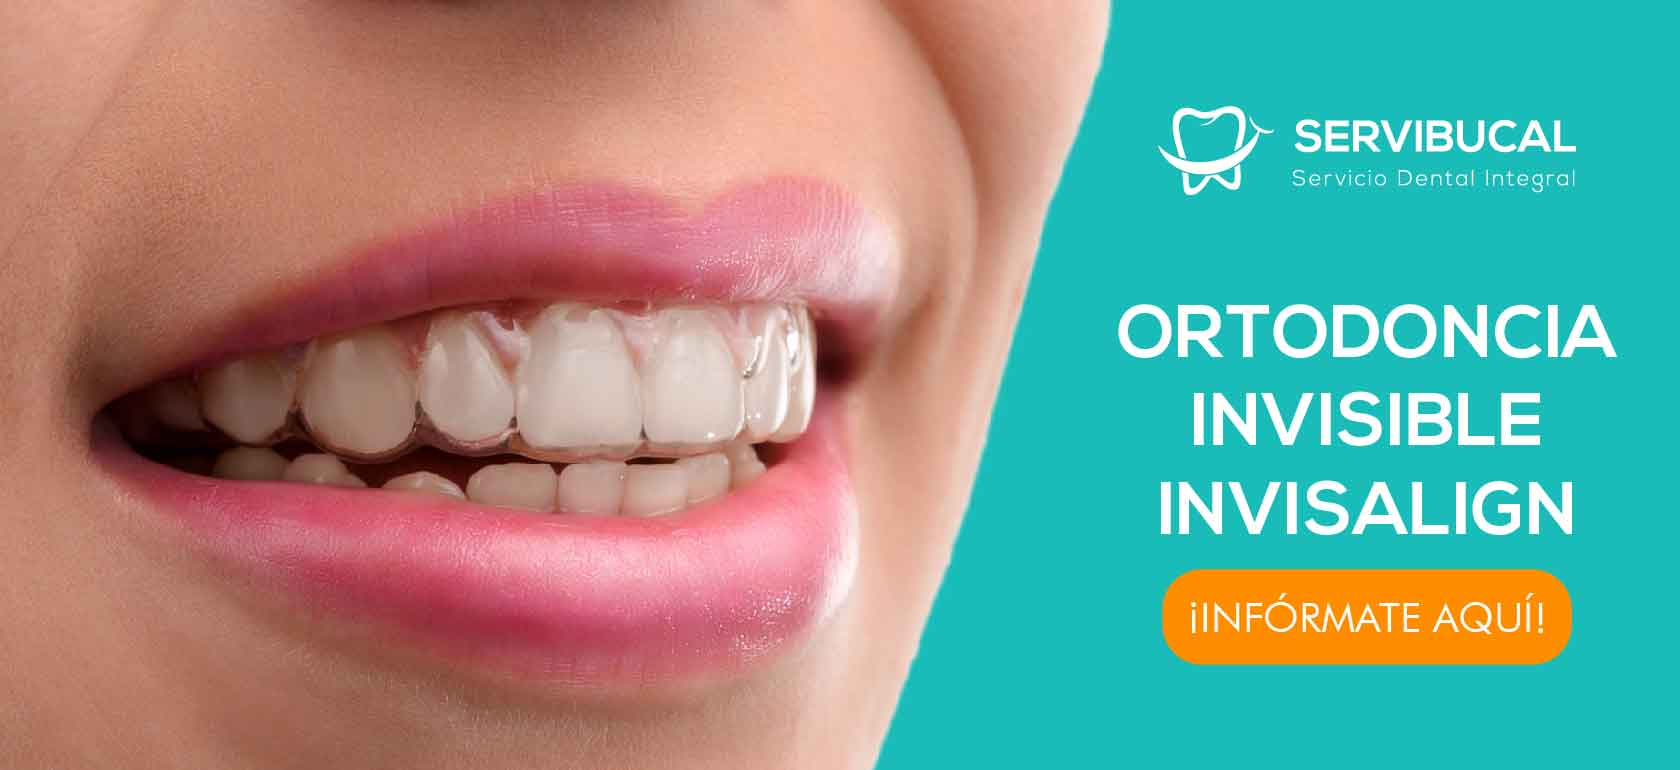 Ortodoncia Invisalign_Mesa de trabajo 1 copia 2